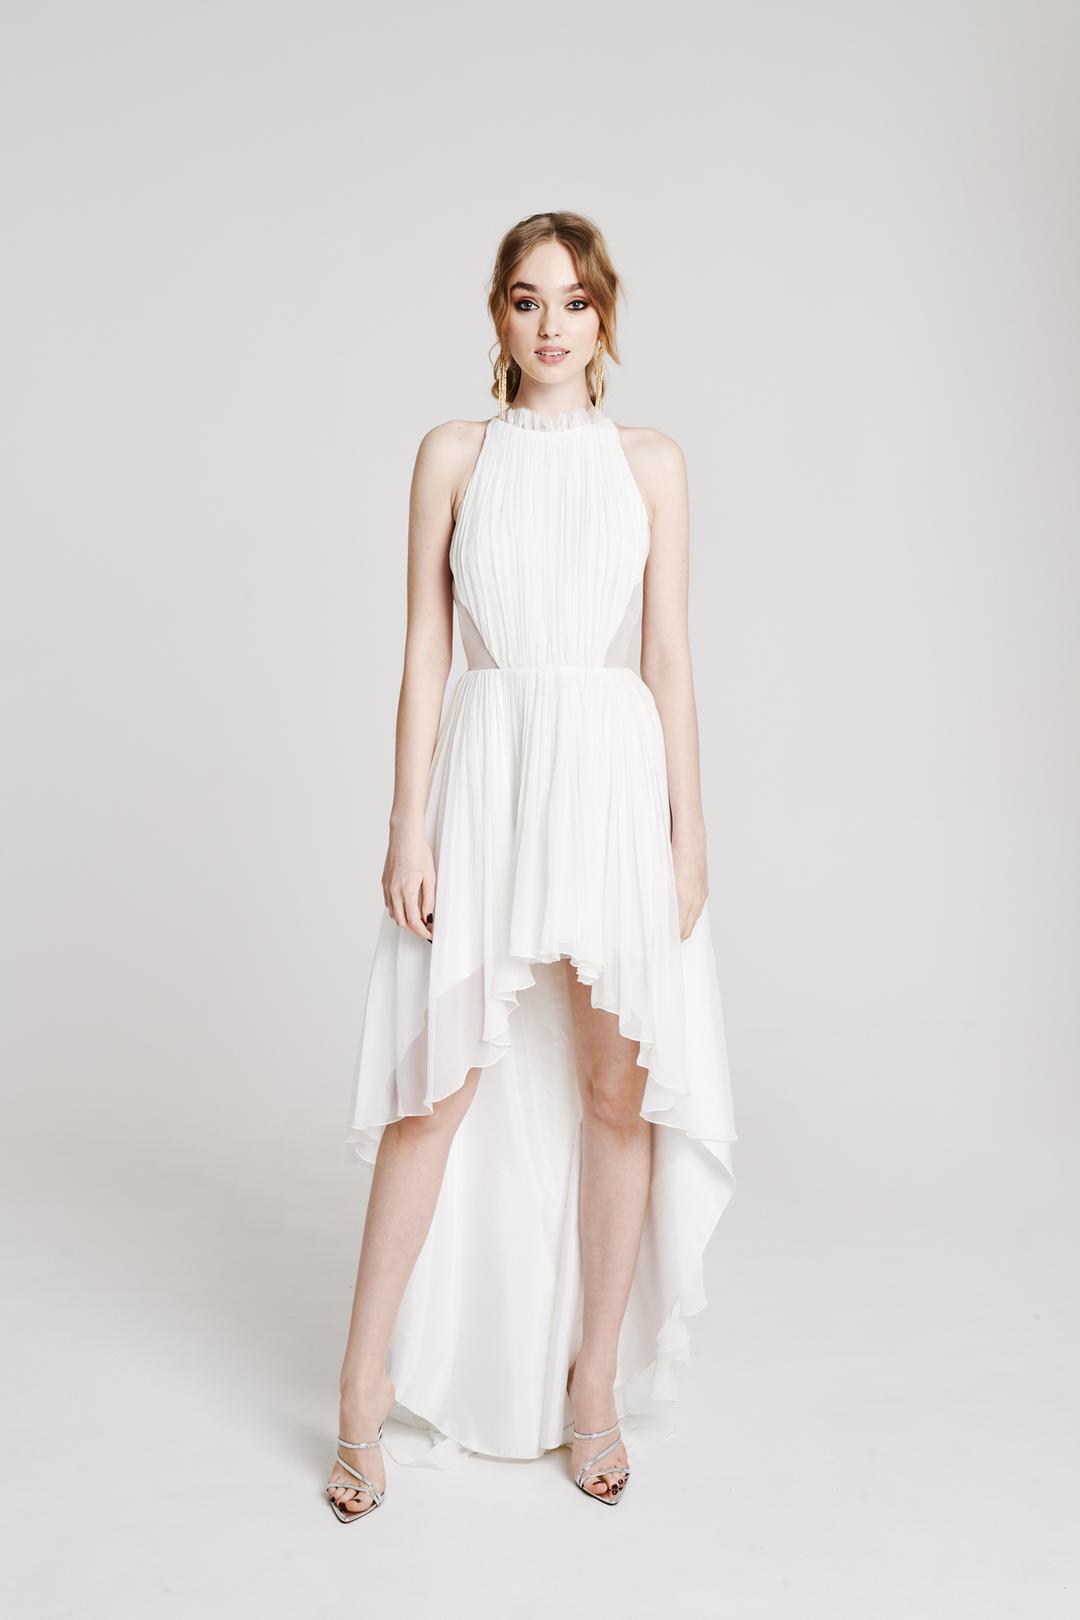 be flashy dress photo